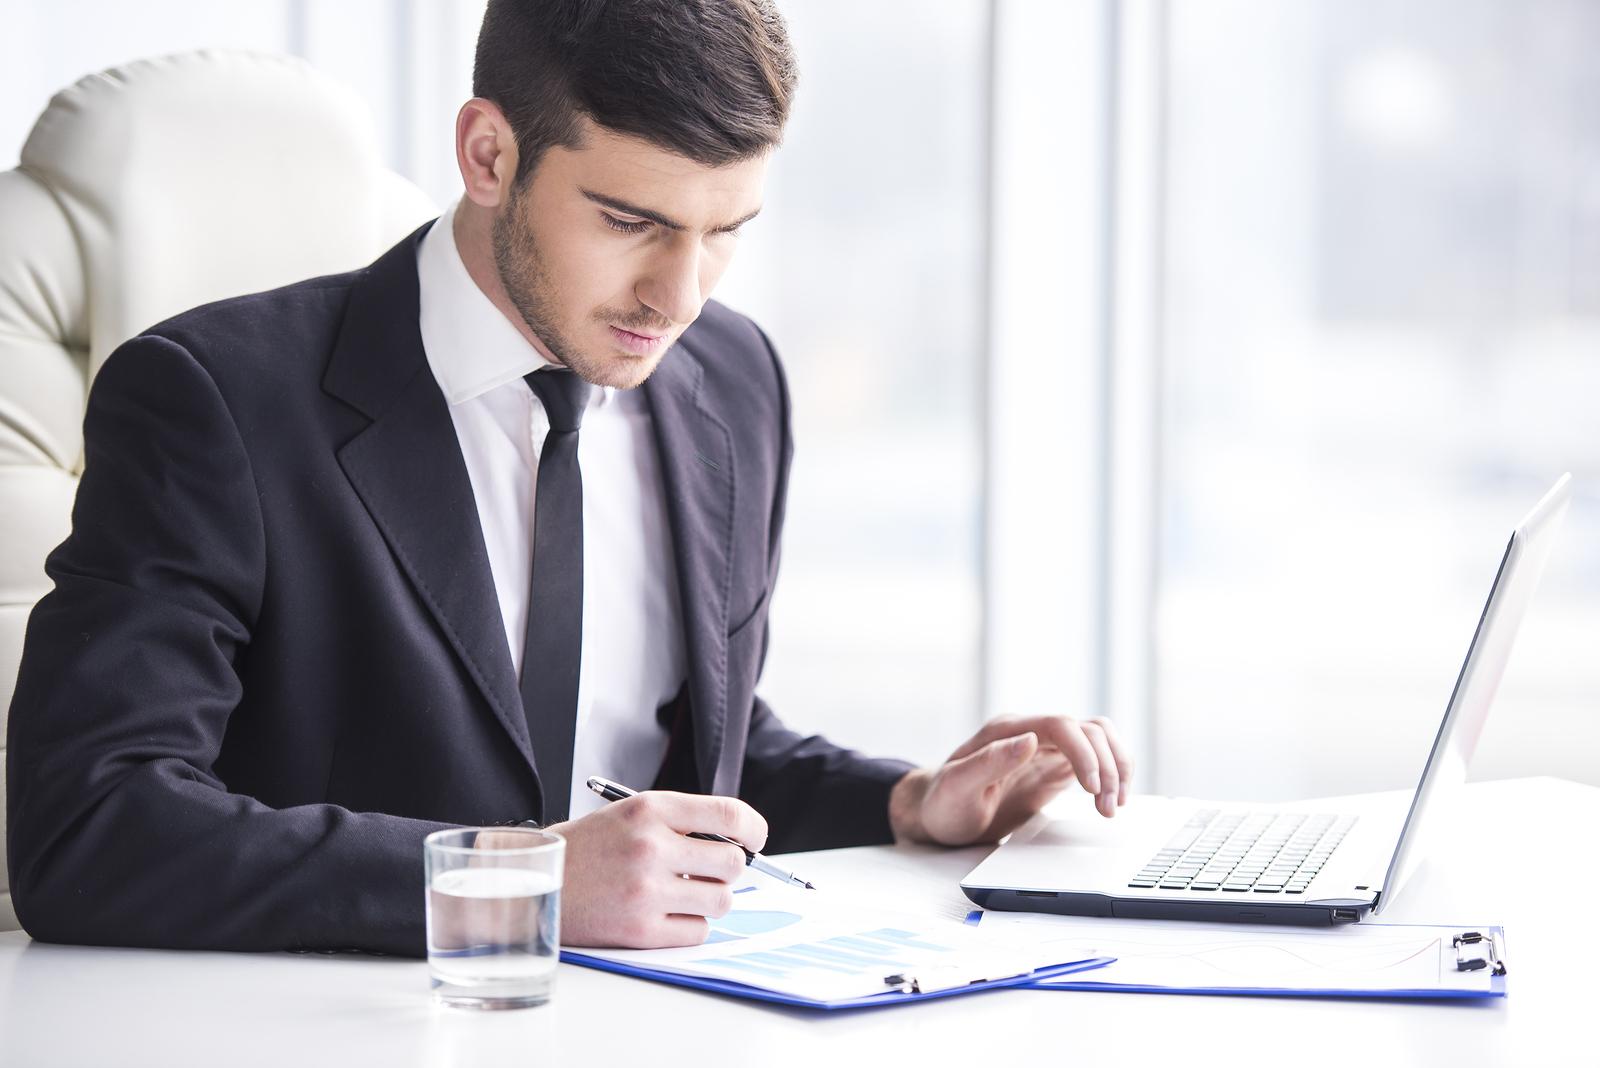 https://i1.wp.com/www.caproasia.com/wp-content/uploads/2015/08/Professional-Banker-3.jpg